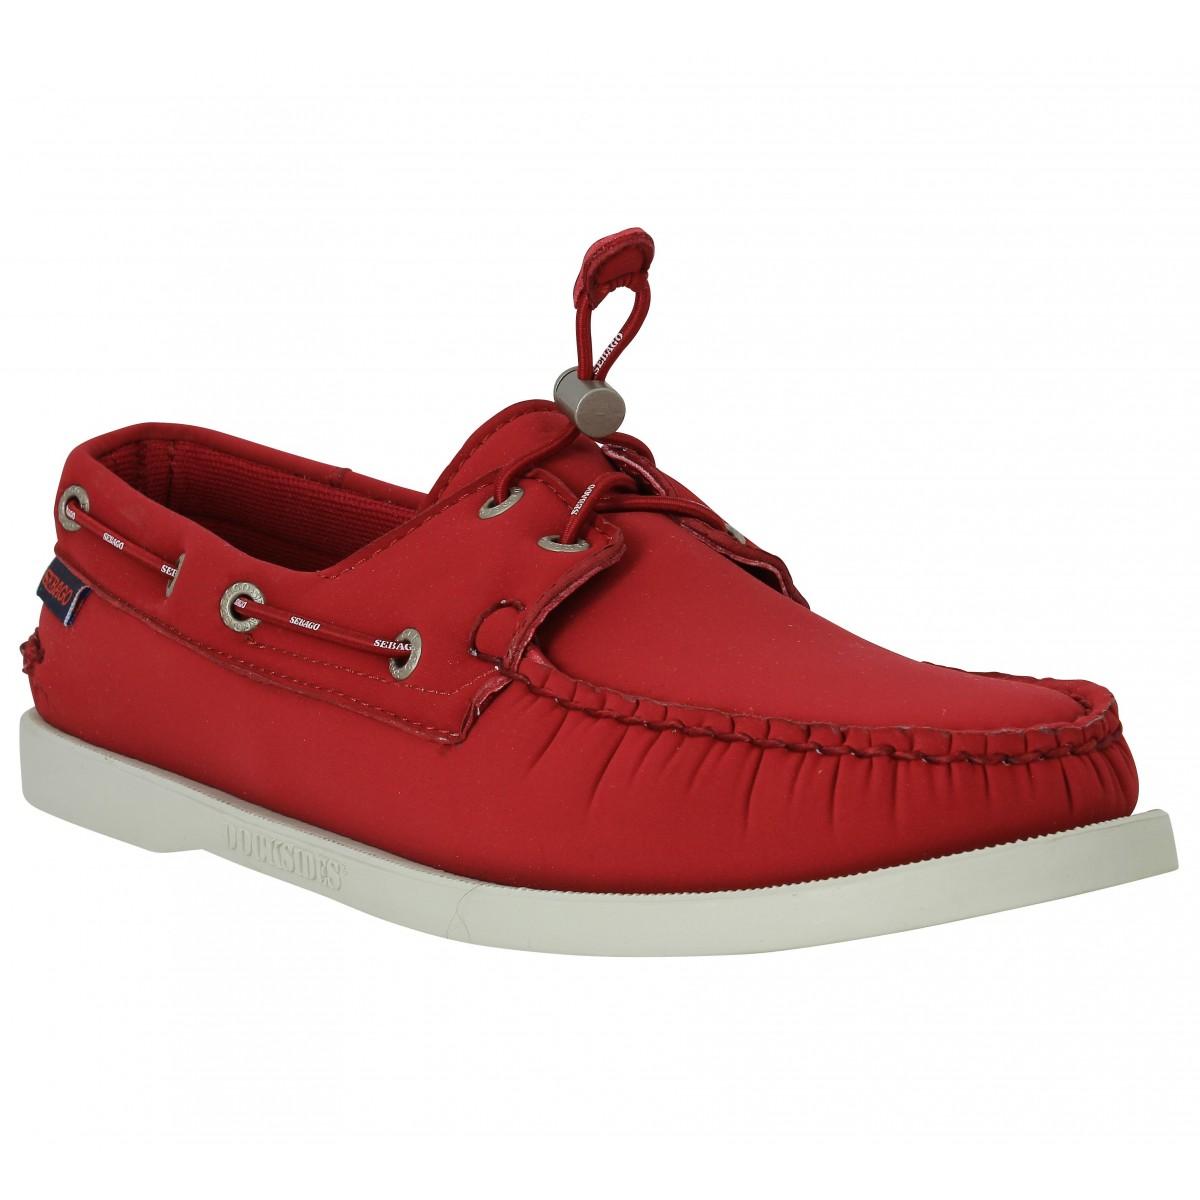 Chaussures bateaux SEBAGO Docksides neoprene Rouge